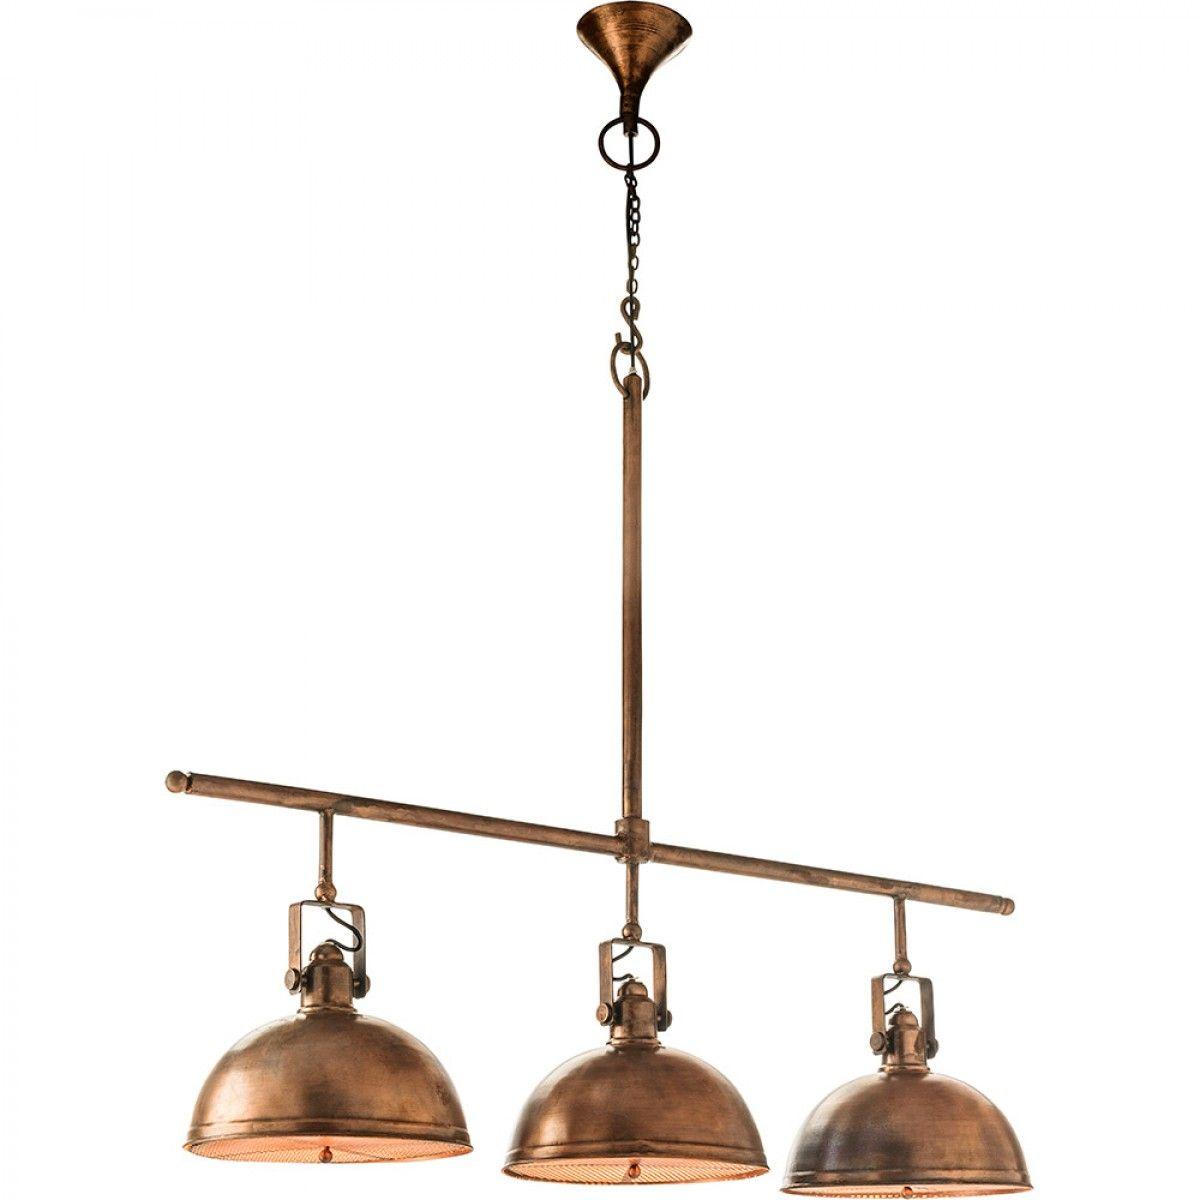 3 light retro servery antique copper finish pendants lighting 3 light retro servery antique copper finish pendants lighting fans aloadofball Gallery